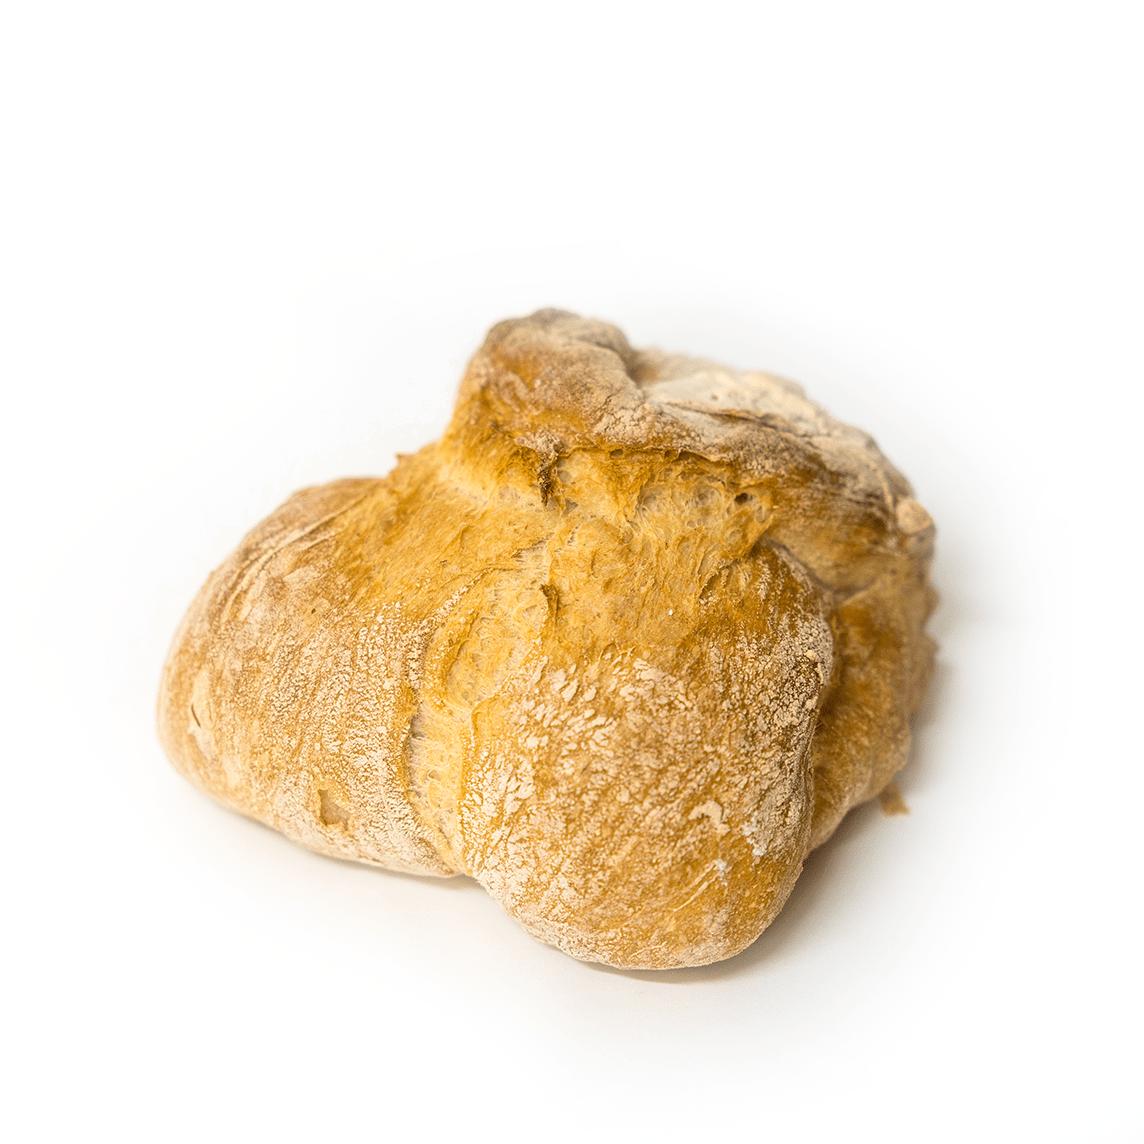 pao-caseiro-pequeno-pao-padaria-pastelaria-entrega-casa-cale-confeitaria-tradicional-portuguesa-peniche-caldas-rainha-padaria-pastelaria